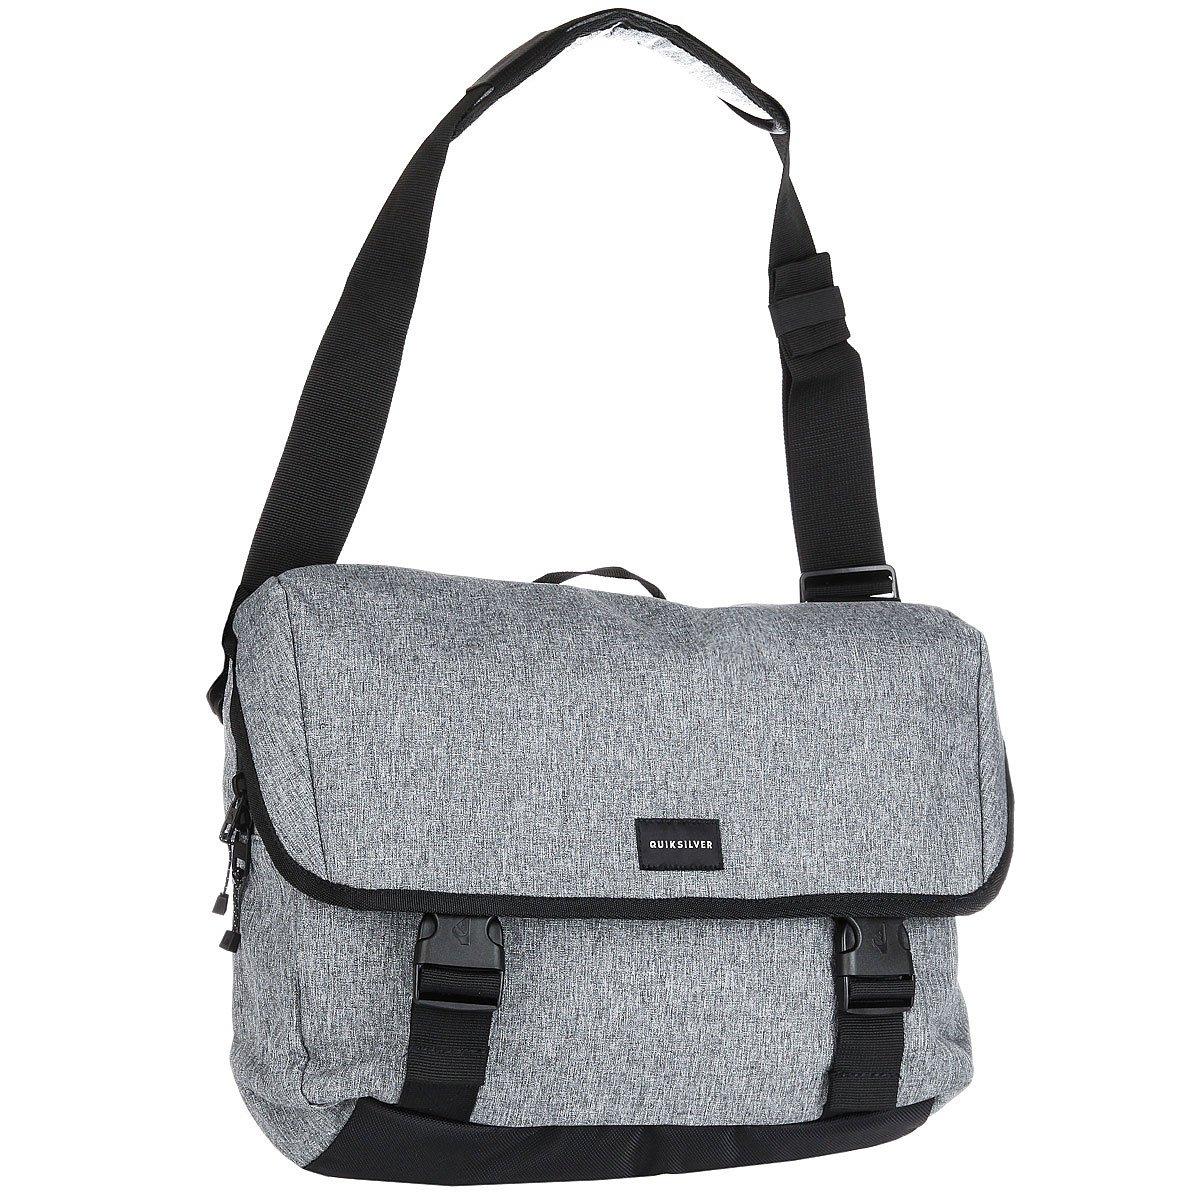 e8211591d2a7 Купить сумку через плечо Quiksilver Carrier Light Grey Heather  (EQYBA03065-SGRH) в интернет-магазине Proskater.by